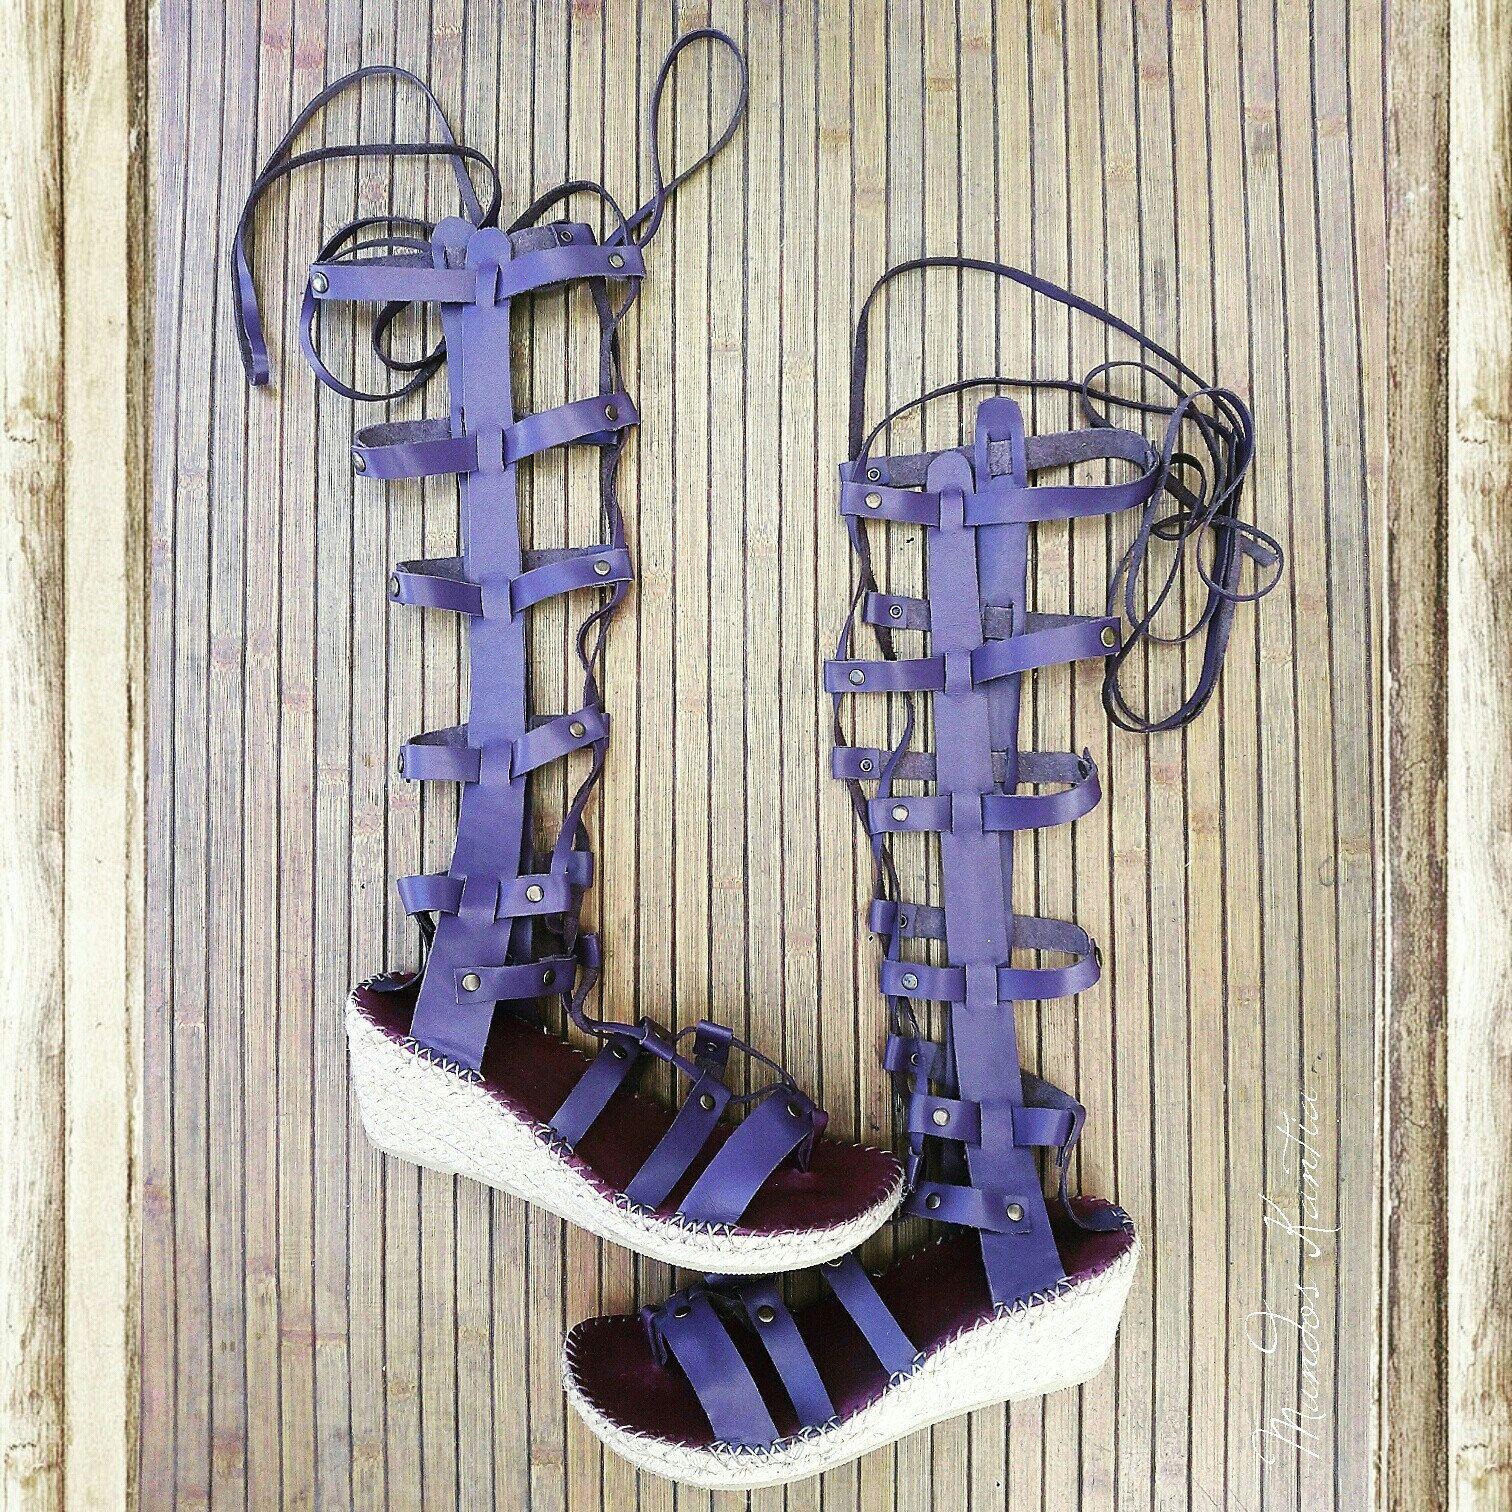 Sandal Espadrille Roman Style Cu A Esparto High Wedge Heel  # Muebles Rodilla